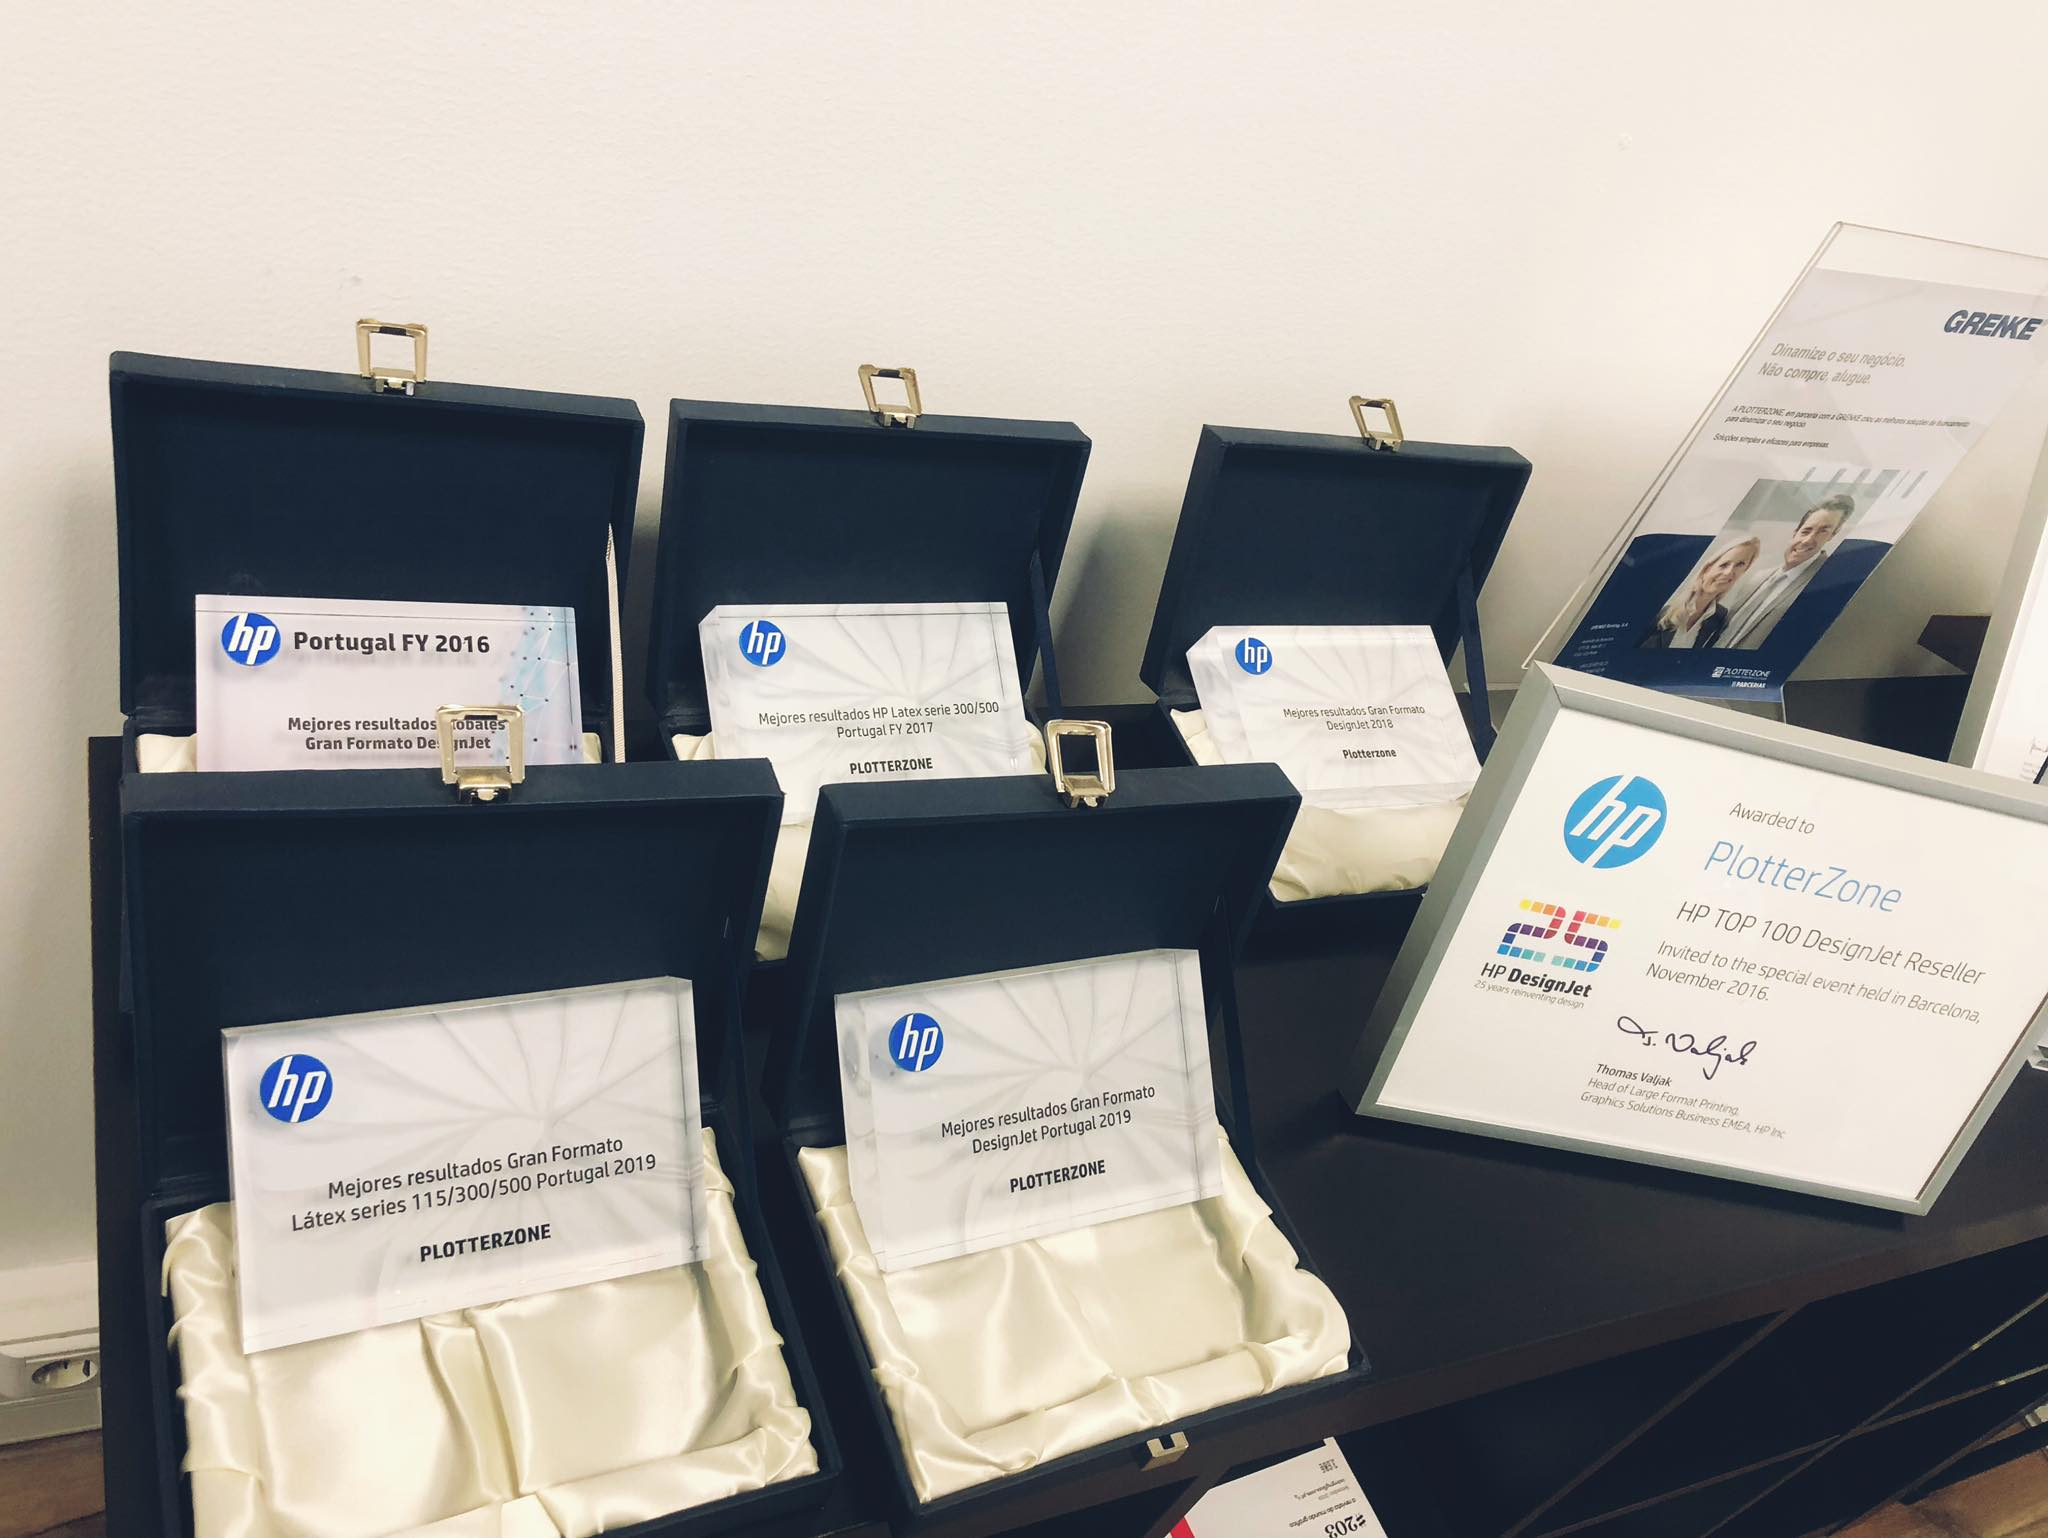 Melhores resultados Grande Formato HP Látex 115/300/500 Portugal 2019